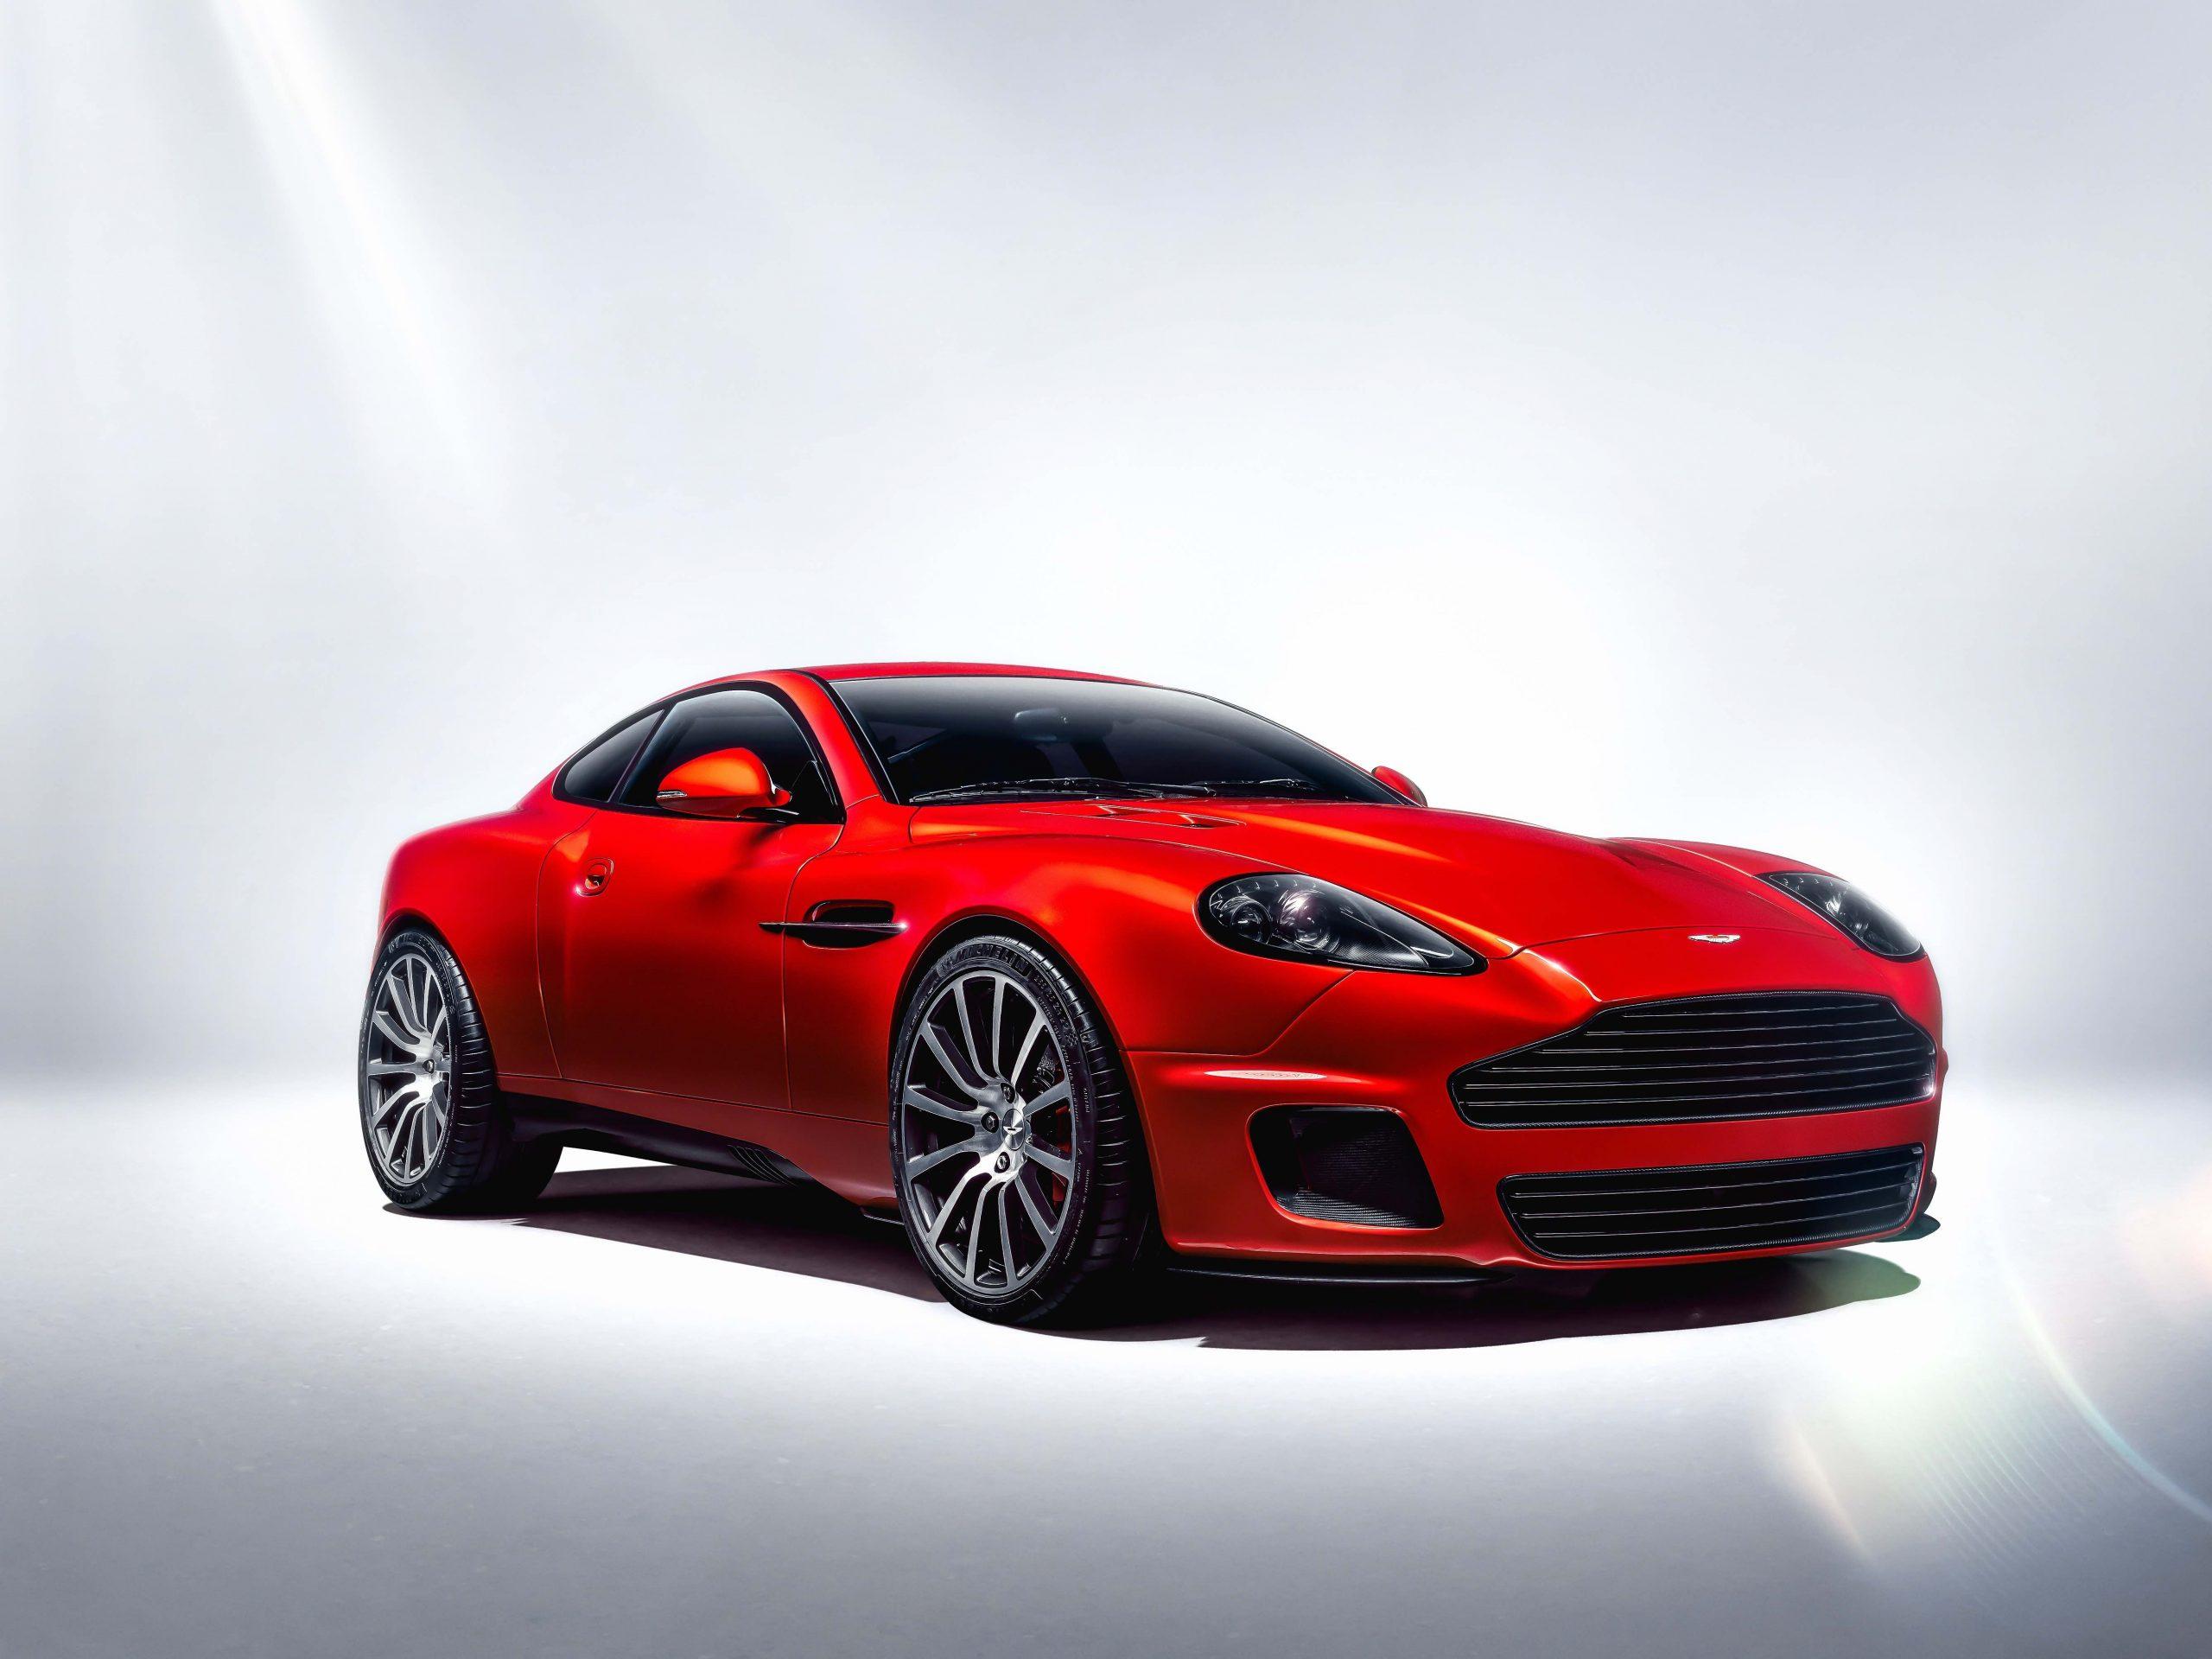 Ian Callum reveals production version of Aston Martin-based Vanquish 25